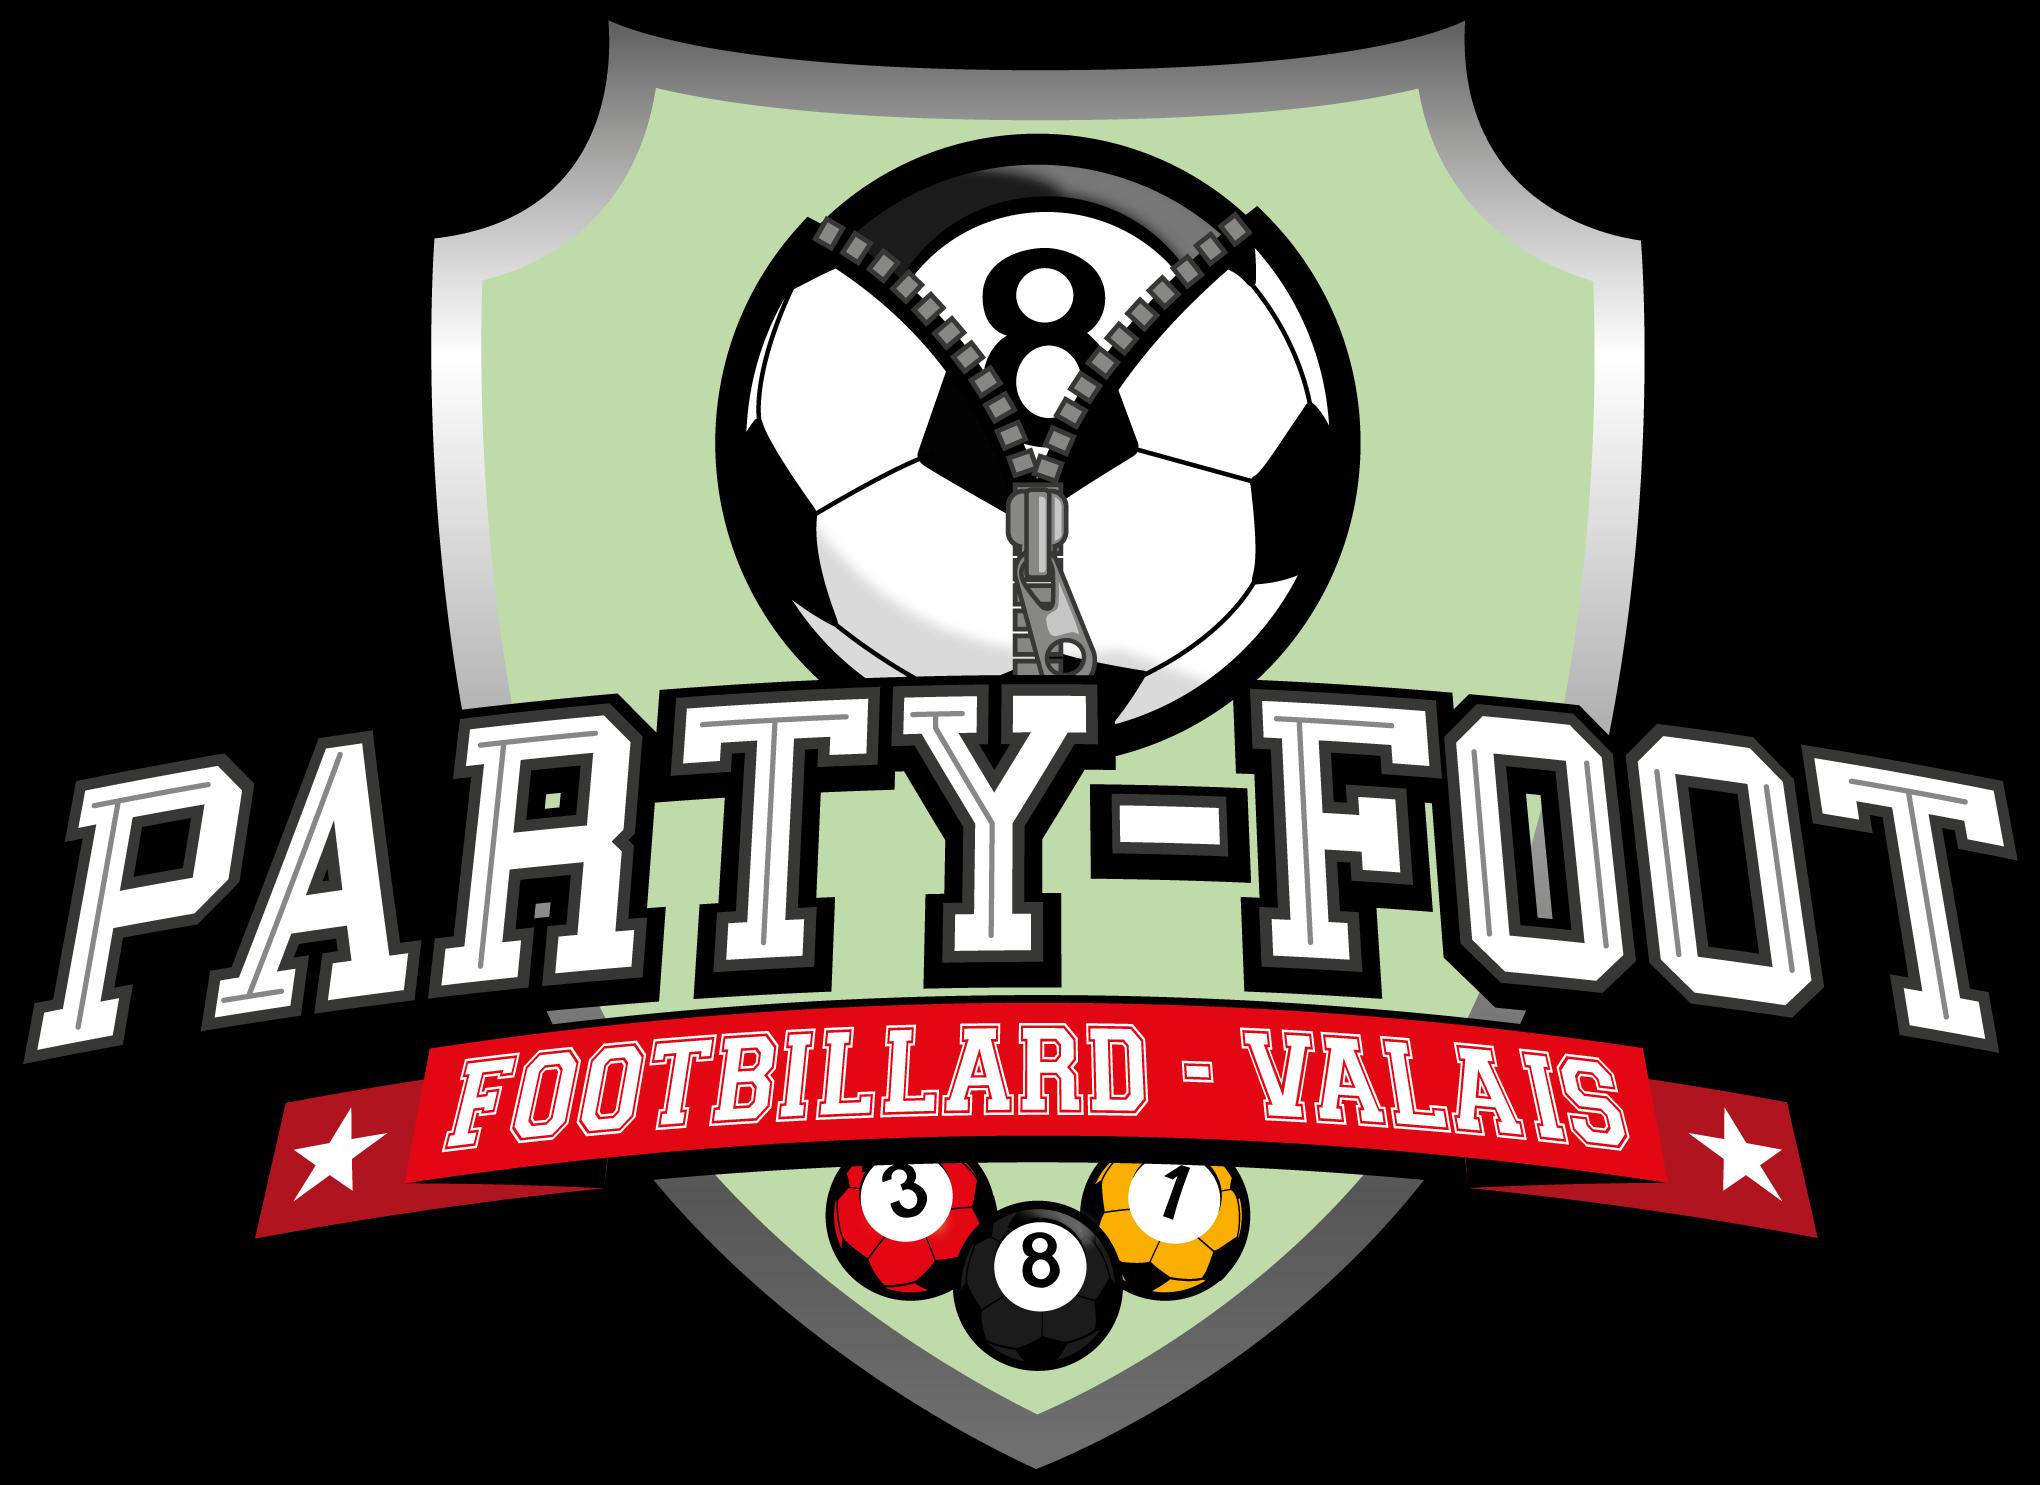 Logo de PARTY-FOOT FOOTBILLARD - VALAIS